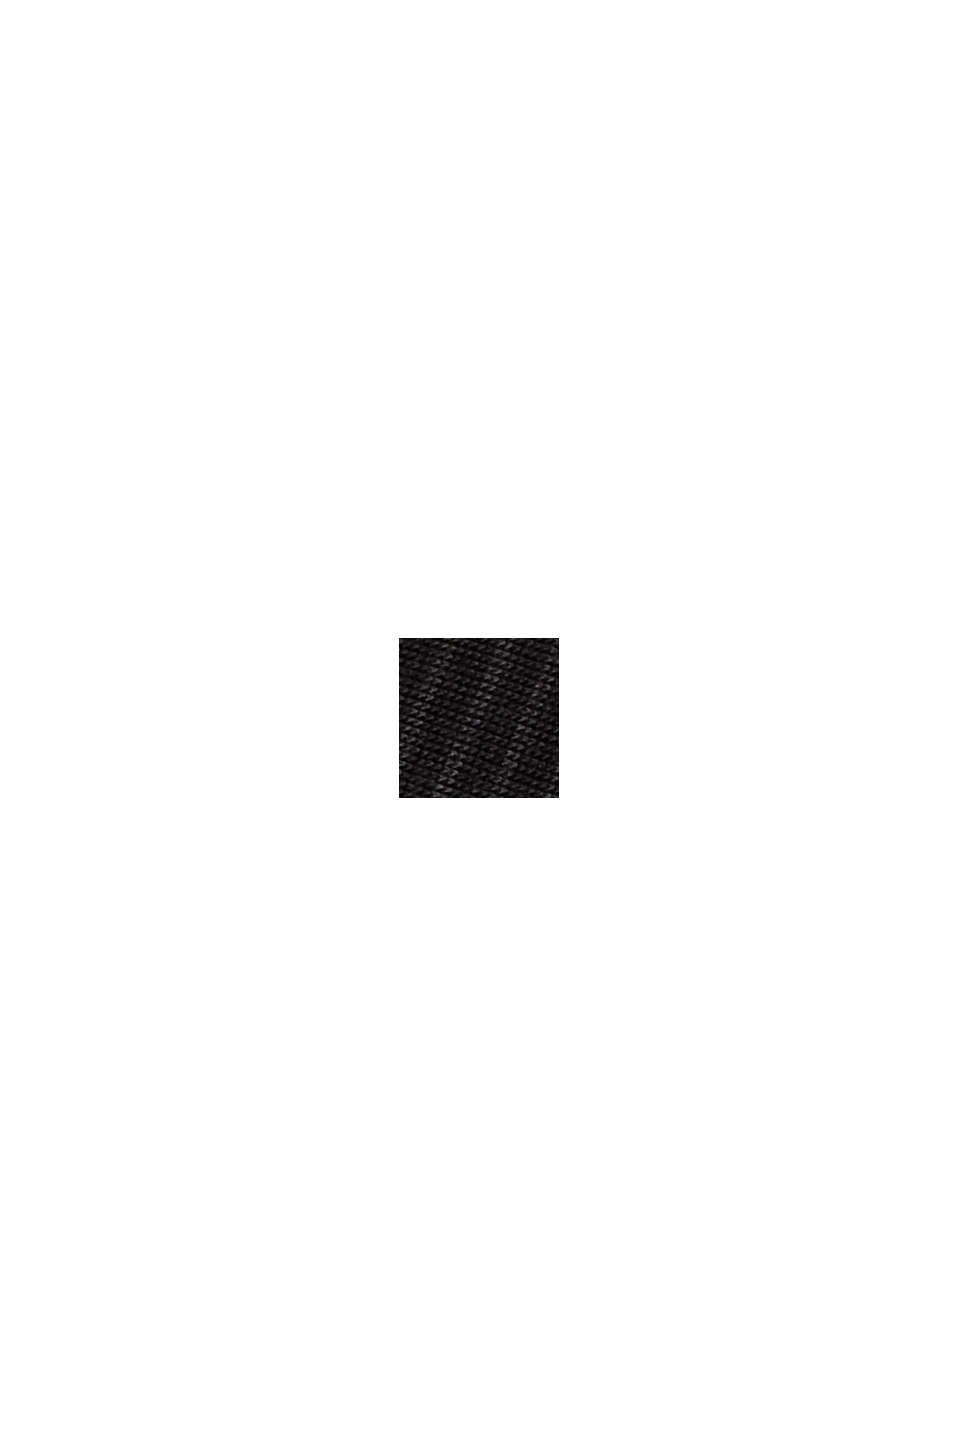 Nachthemd met kant, LENZING™ ECOVERO™, BLACK, swatch